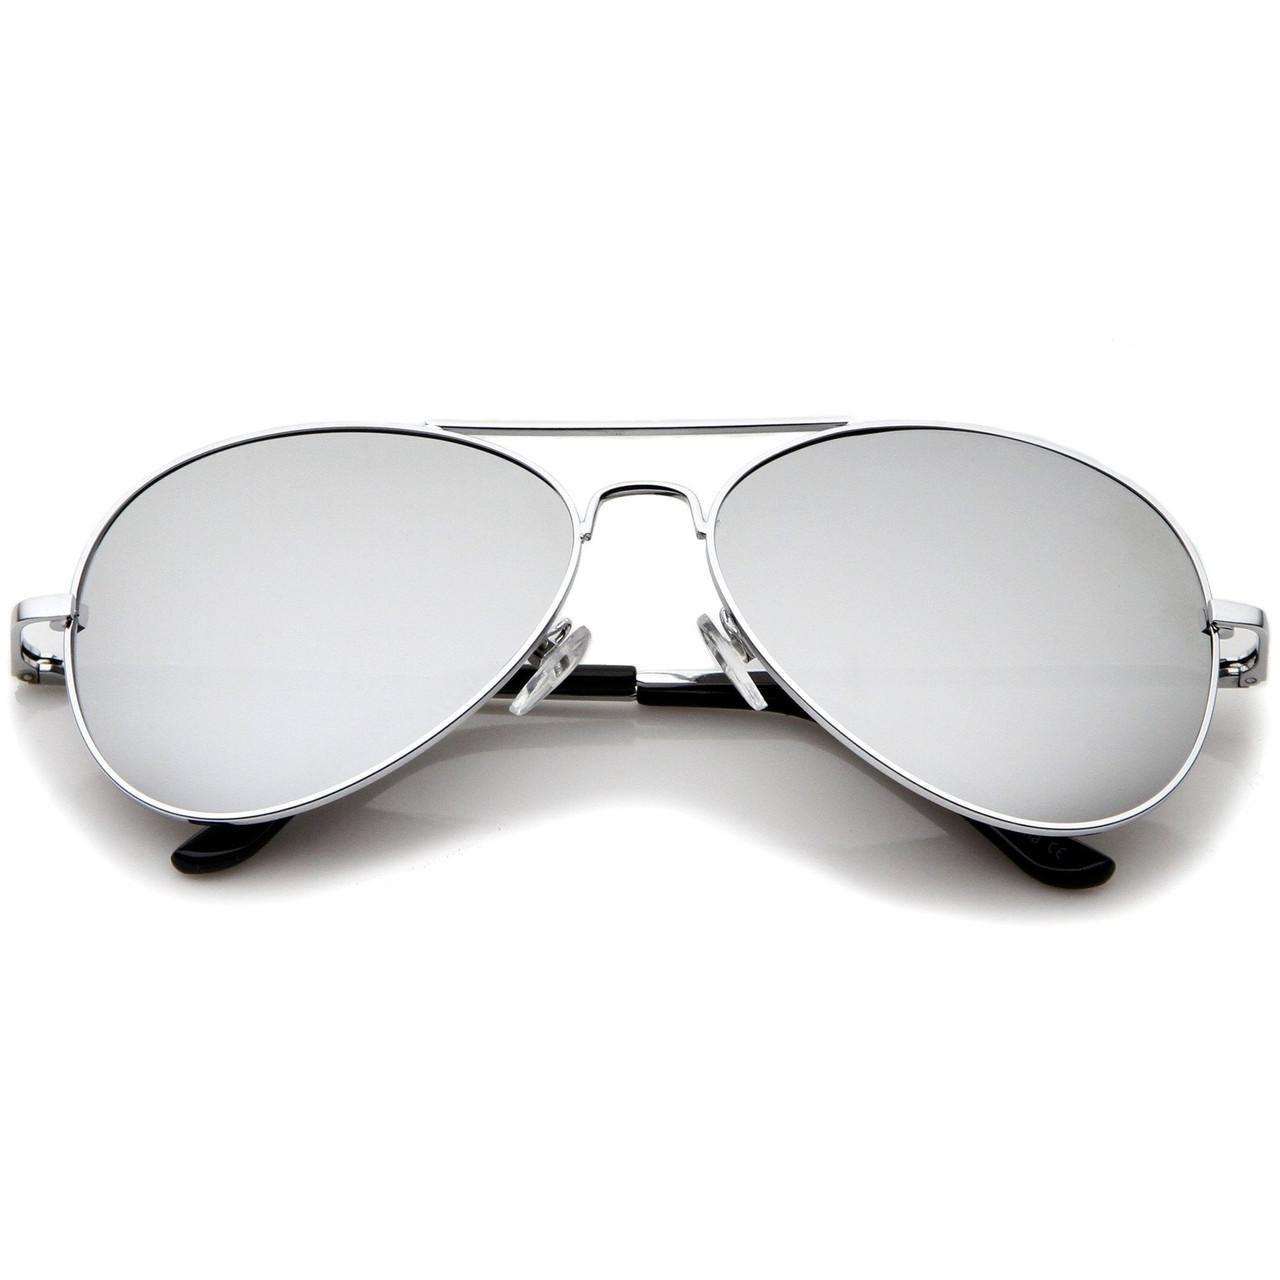 0174b2f1022b1 Bulk Silver Aviator Sunglasses